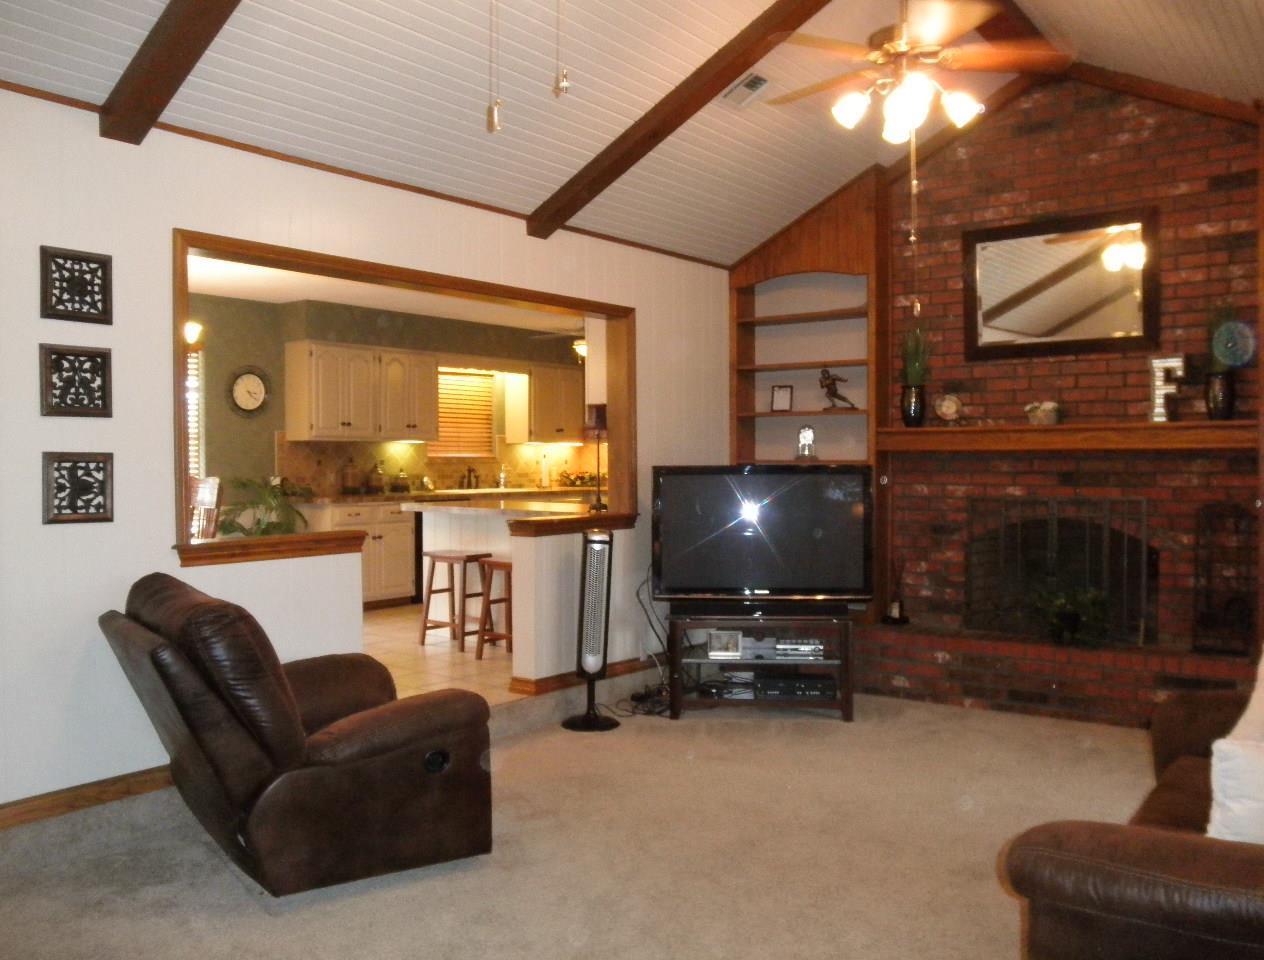 Sold Cross Sale W/ MLS | 2805 Ames  Ponca City, OK  4